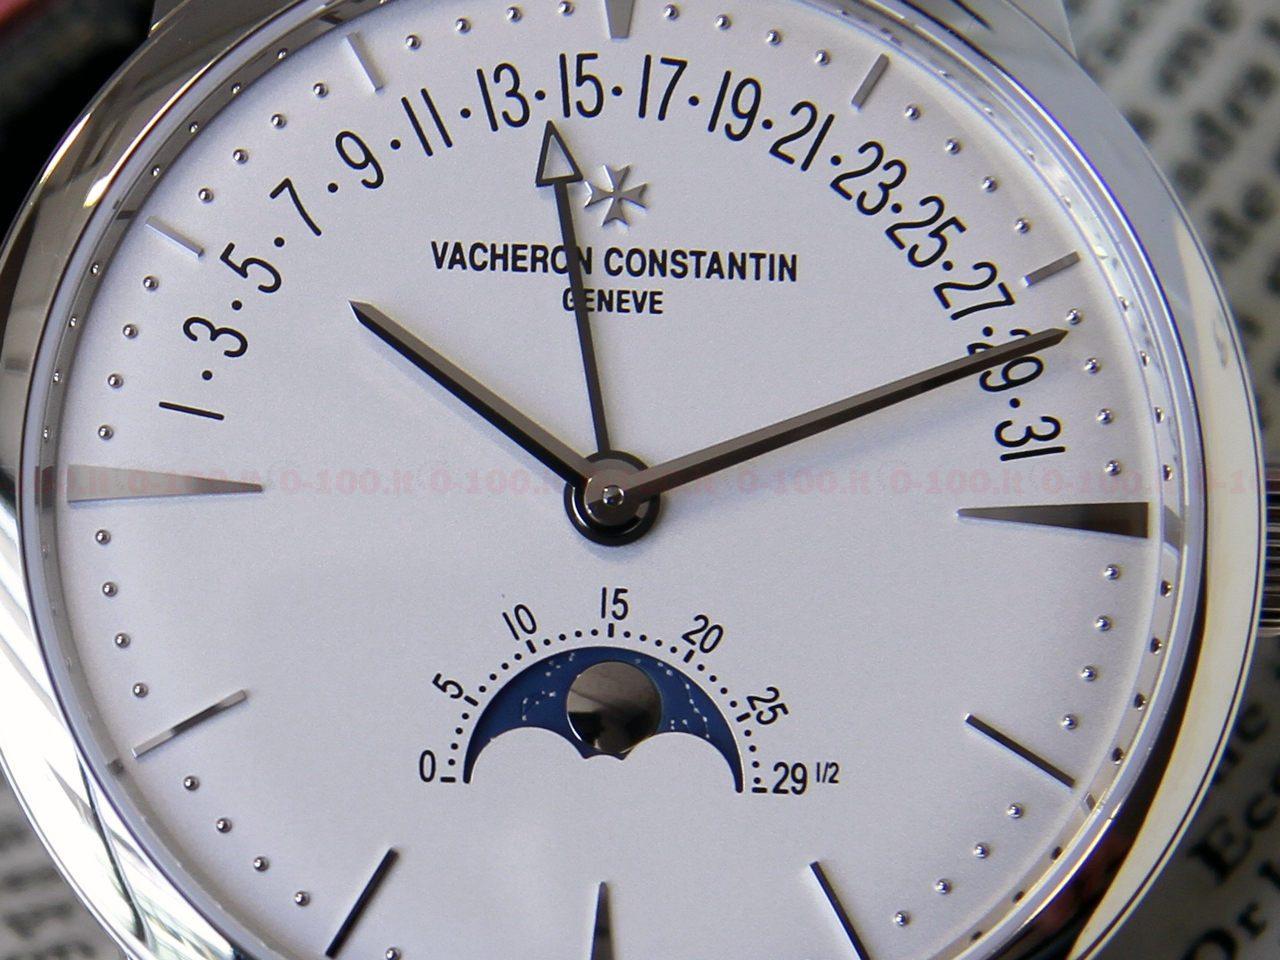 test-watch-sihh-2017-vacheron-constantin-patrimony-fasi-lunari-e-calendario-retrogrado-ref-4010u000g-b330-prezzo-price_0-10031